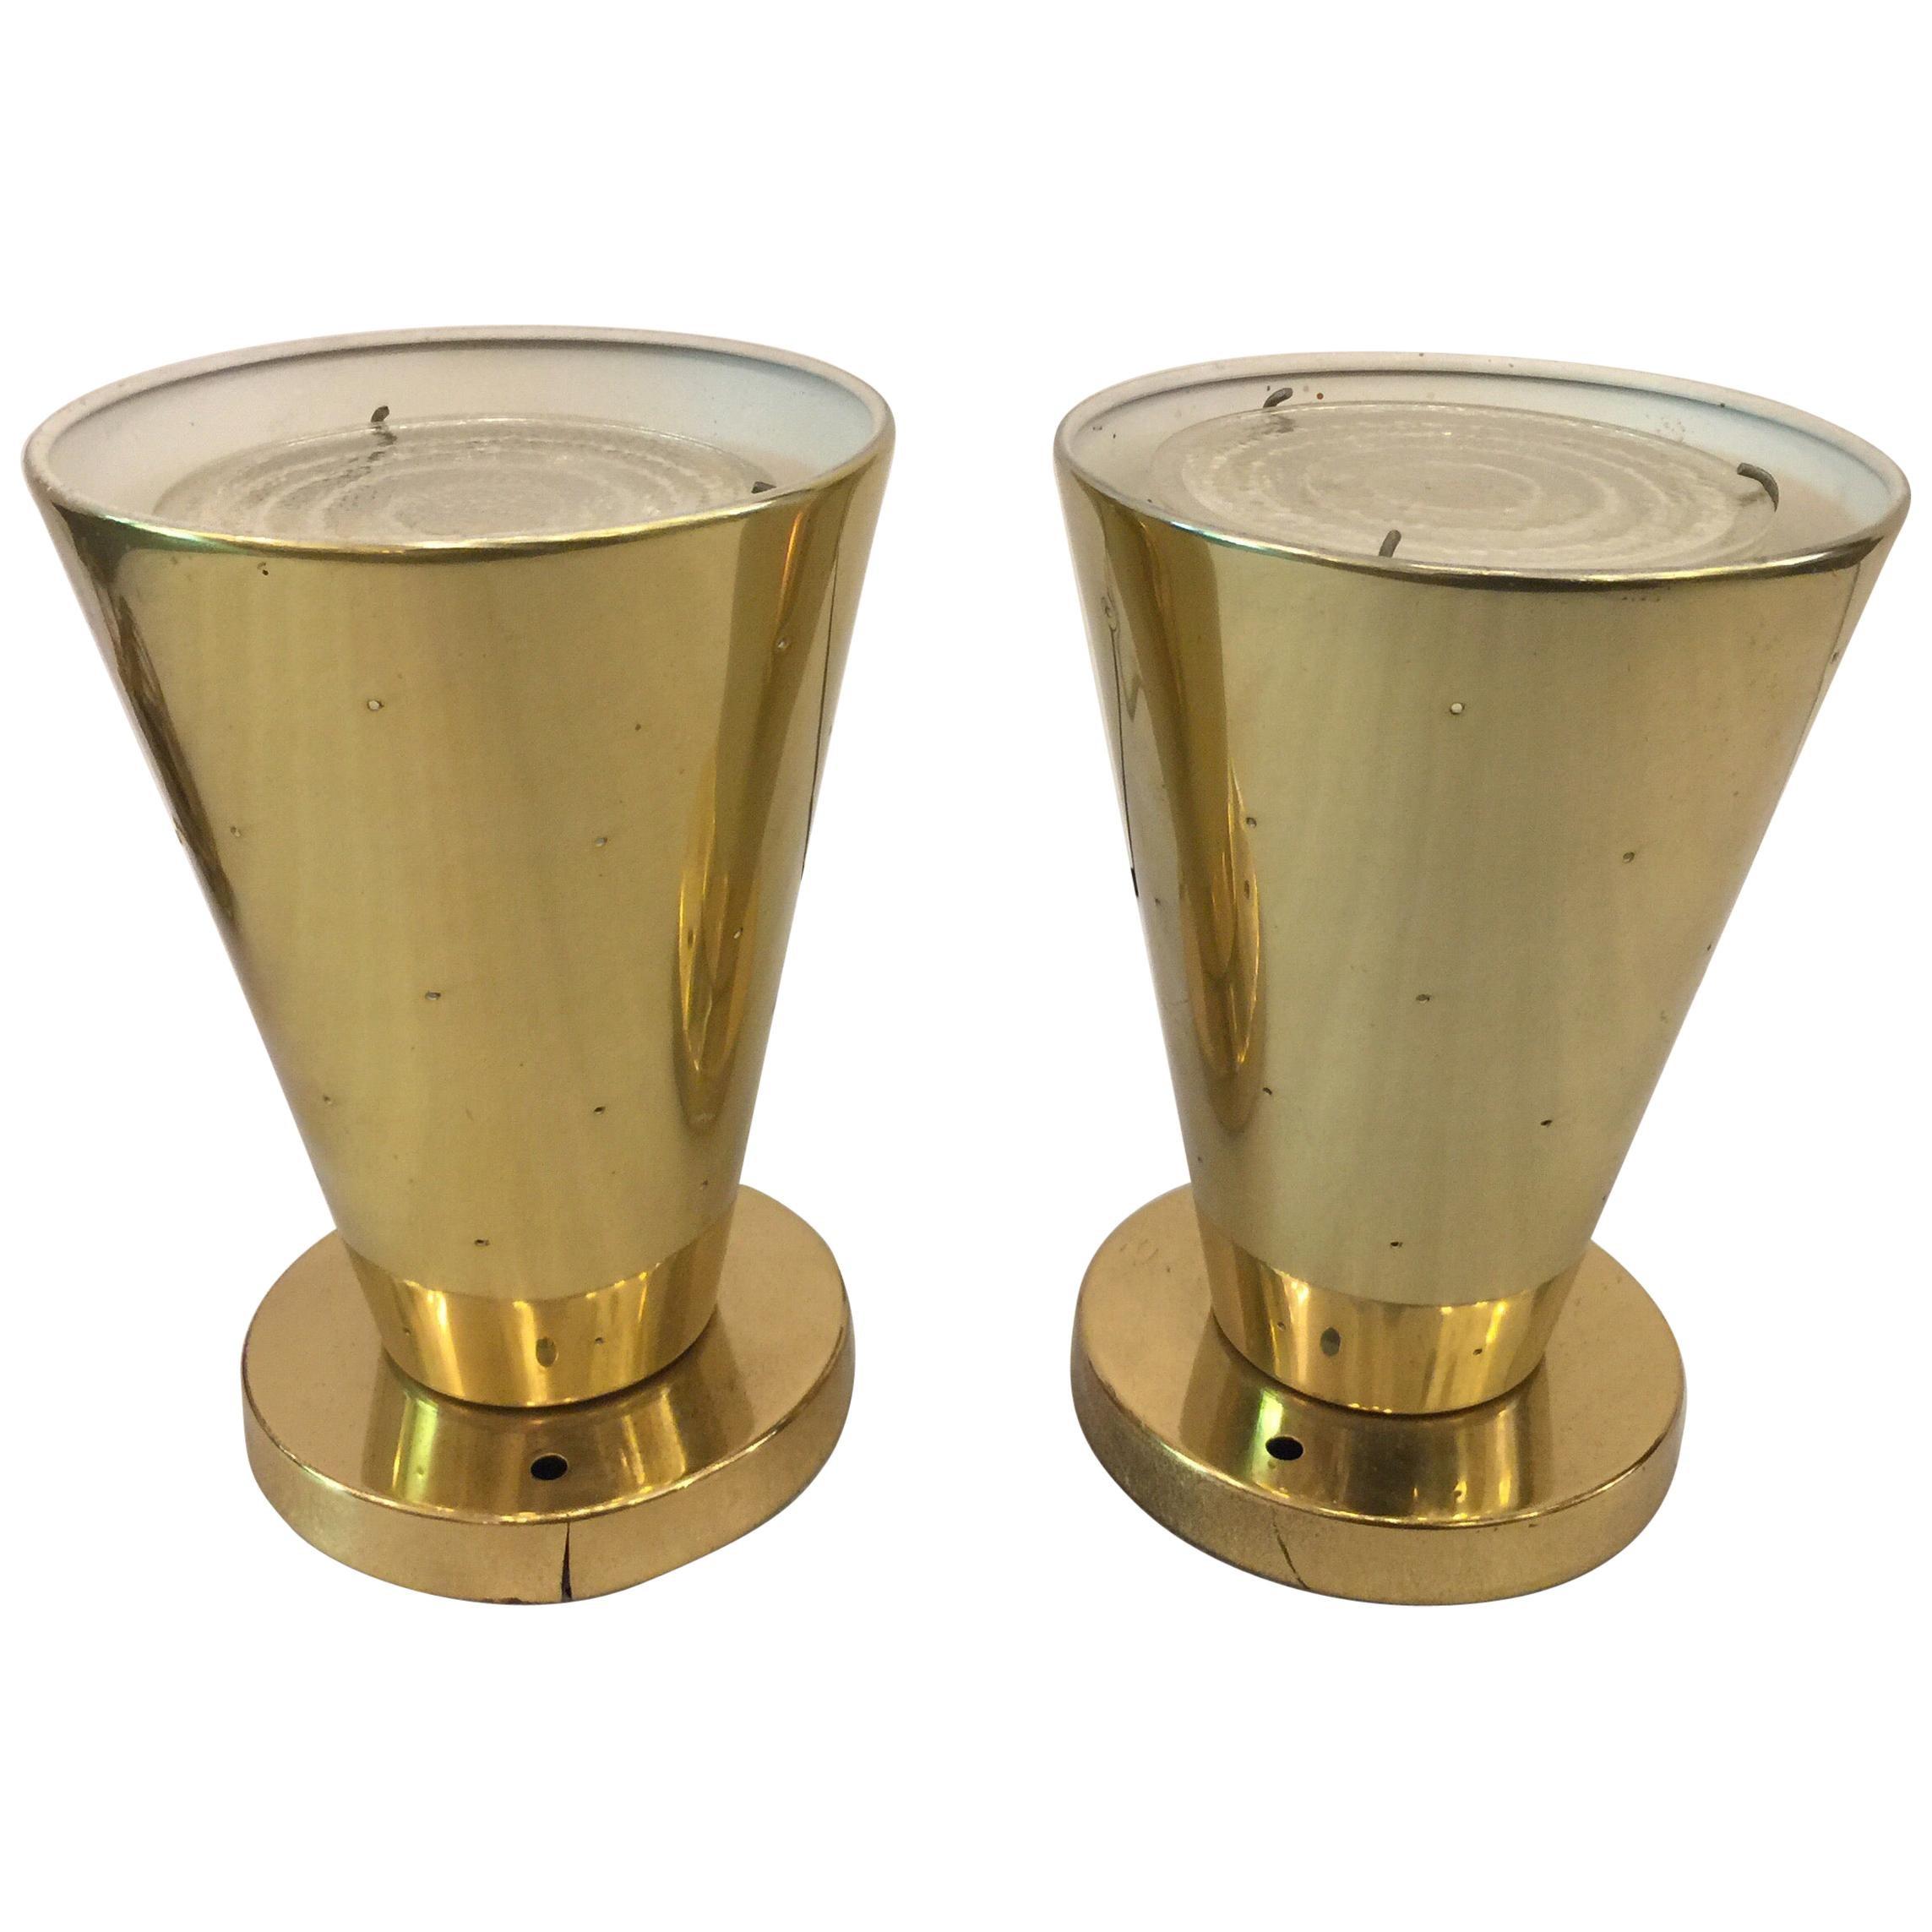 Midcentury Gerald Thurston for Lightolier Ceiling Cone Fixtures, Pair